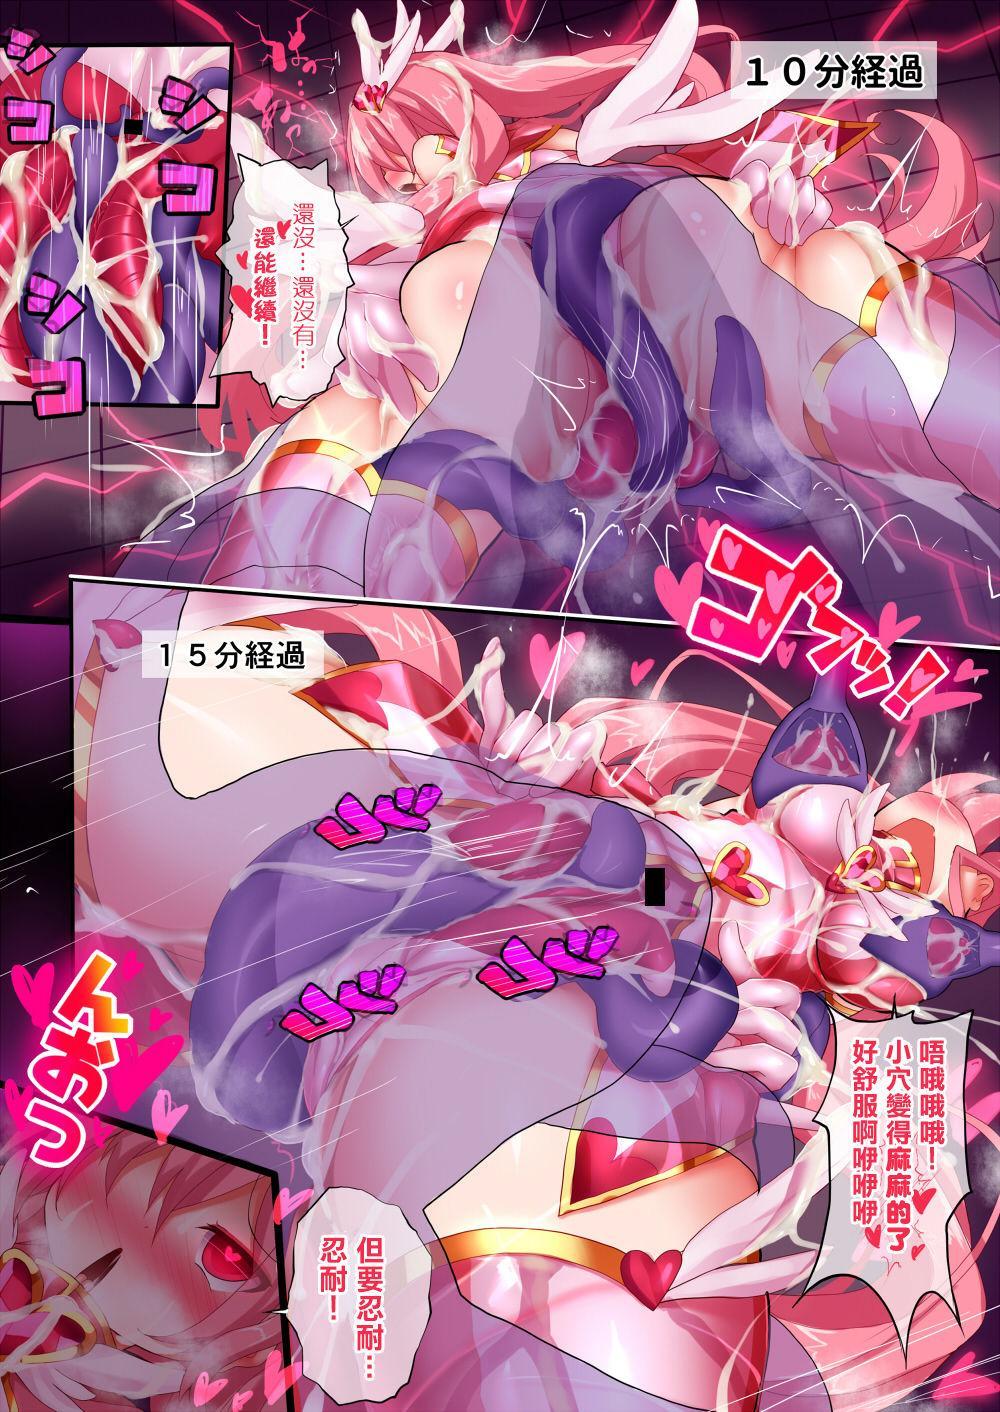 [Makutsutei (Nagai Wataru)] Orgasm Unit EX -Mahou Senshi Akari Ch. 1-5 [Chinese] [这很恶堕 x Lolipoi汉化组] 17